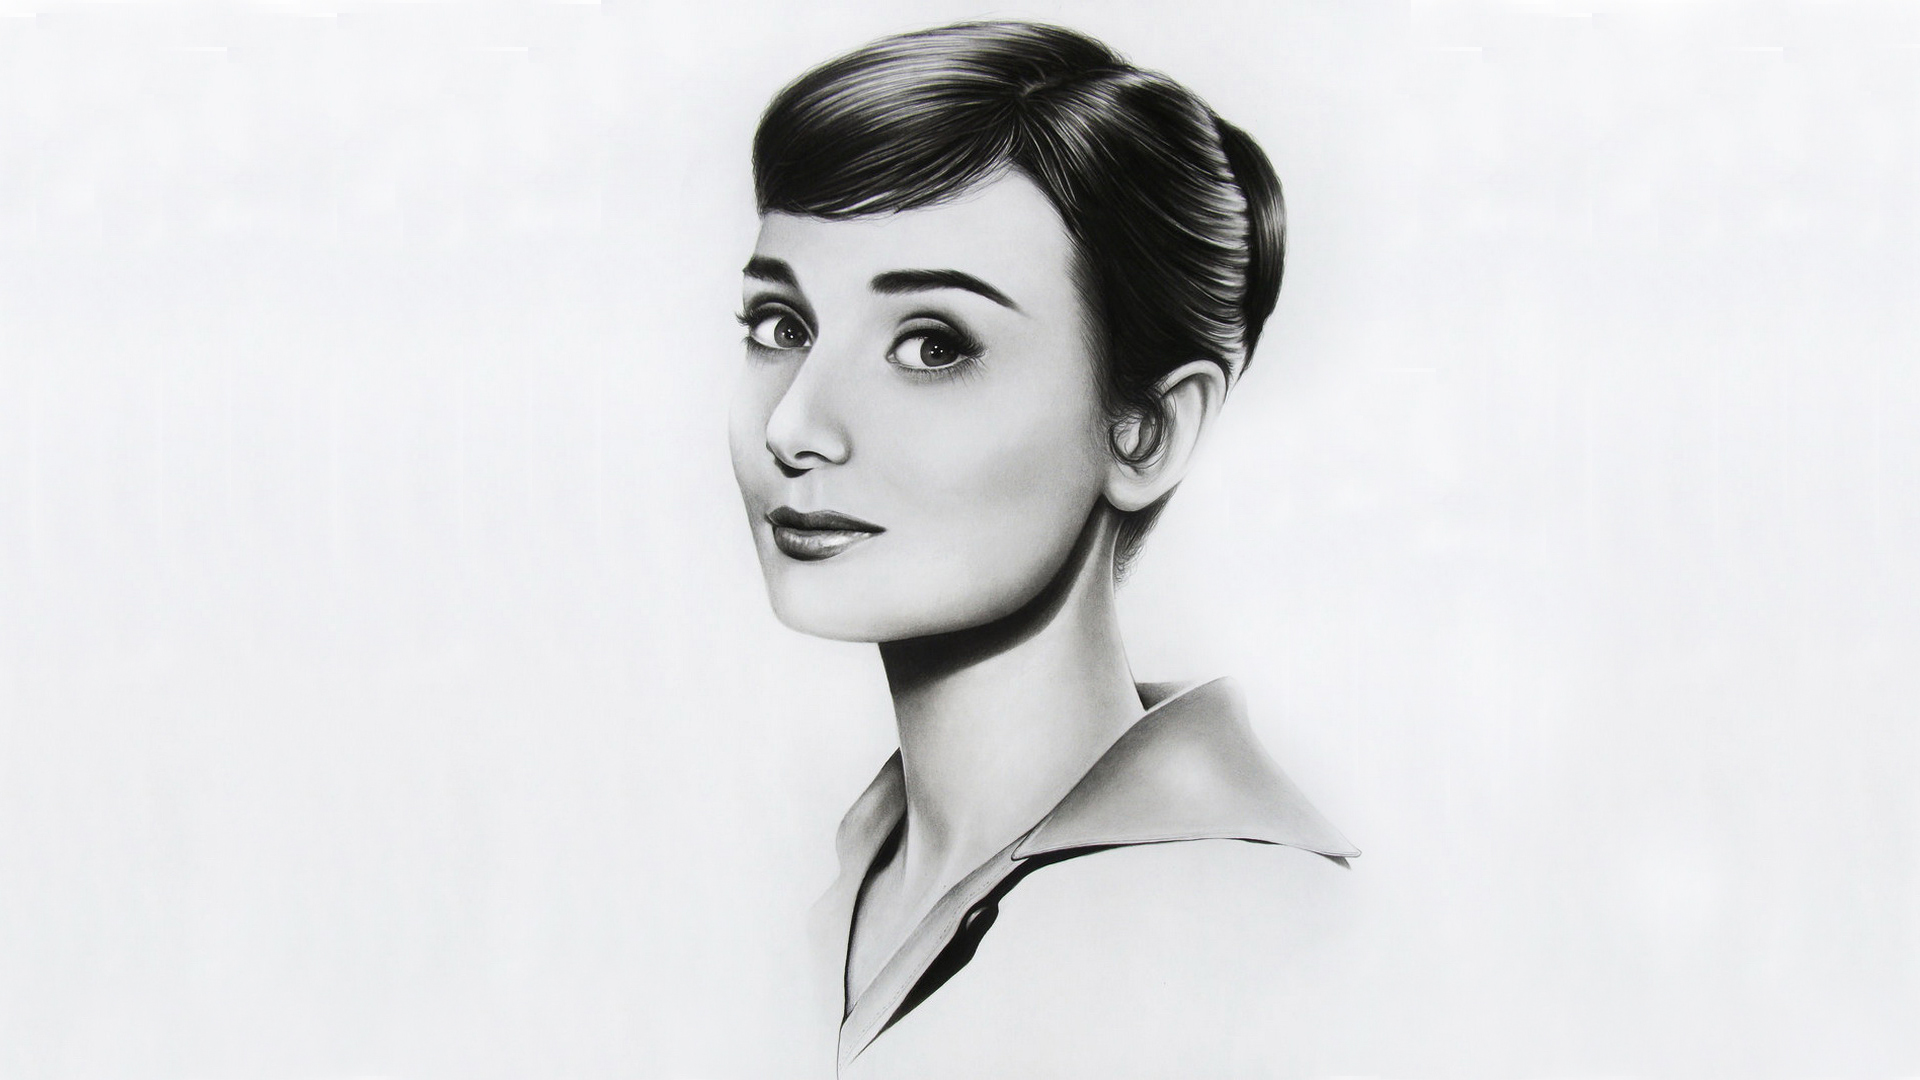 Audrey Hepburn Desktop Background   Wallpaper High Definition High 1920x1080